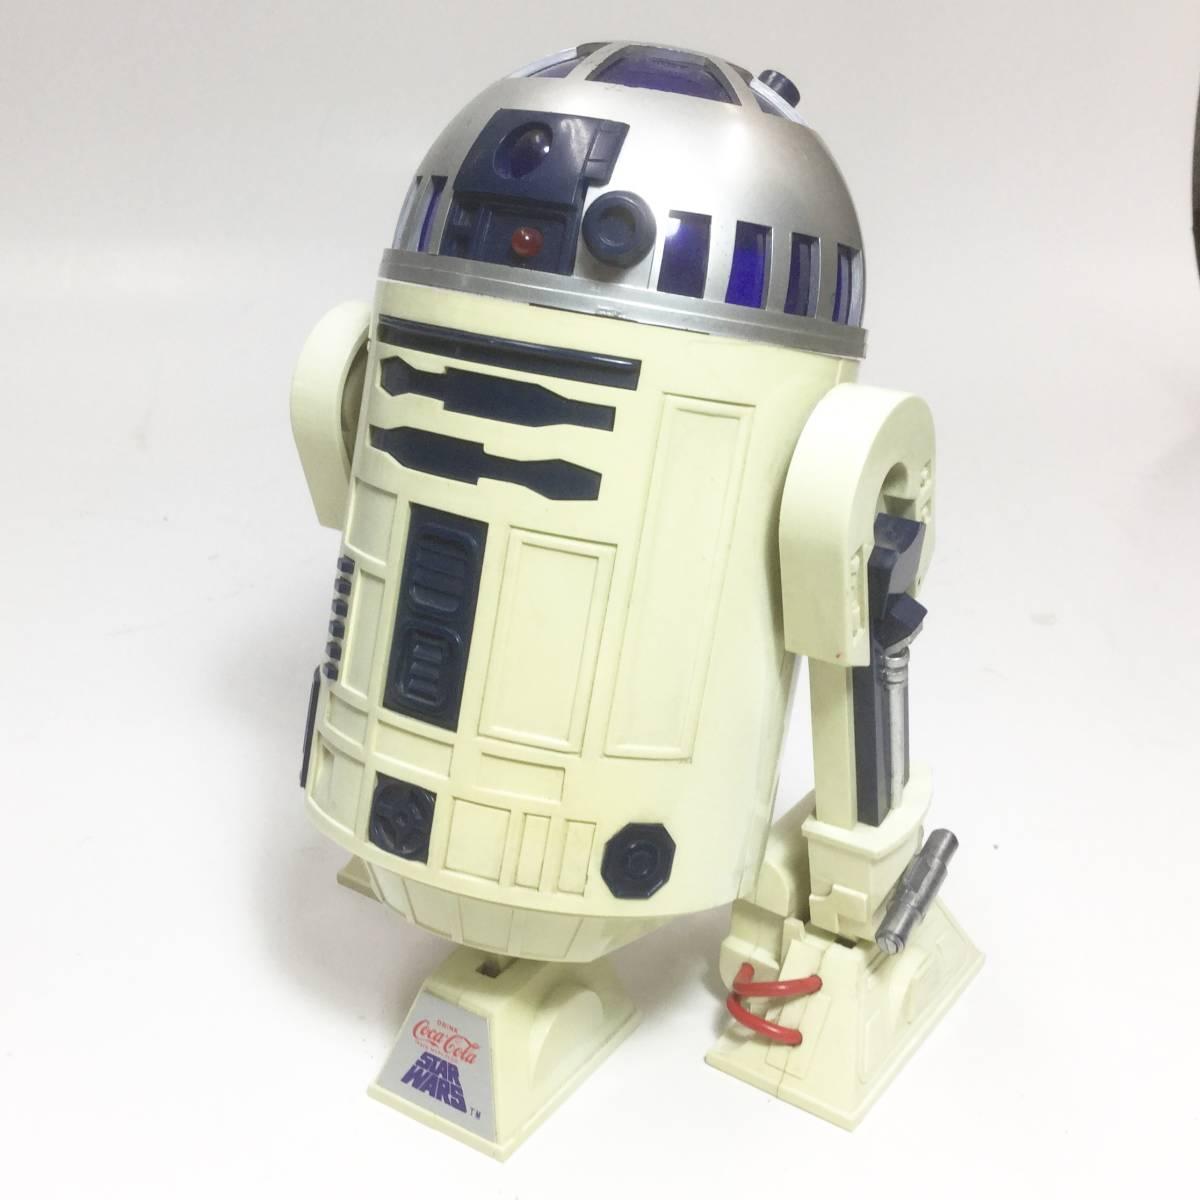 R2-D2 ラジオ 作動品 スターウォーズ 1977年版 コカコーラ 懸賞品 非売品 レトロ ビンテージ _画像2